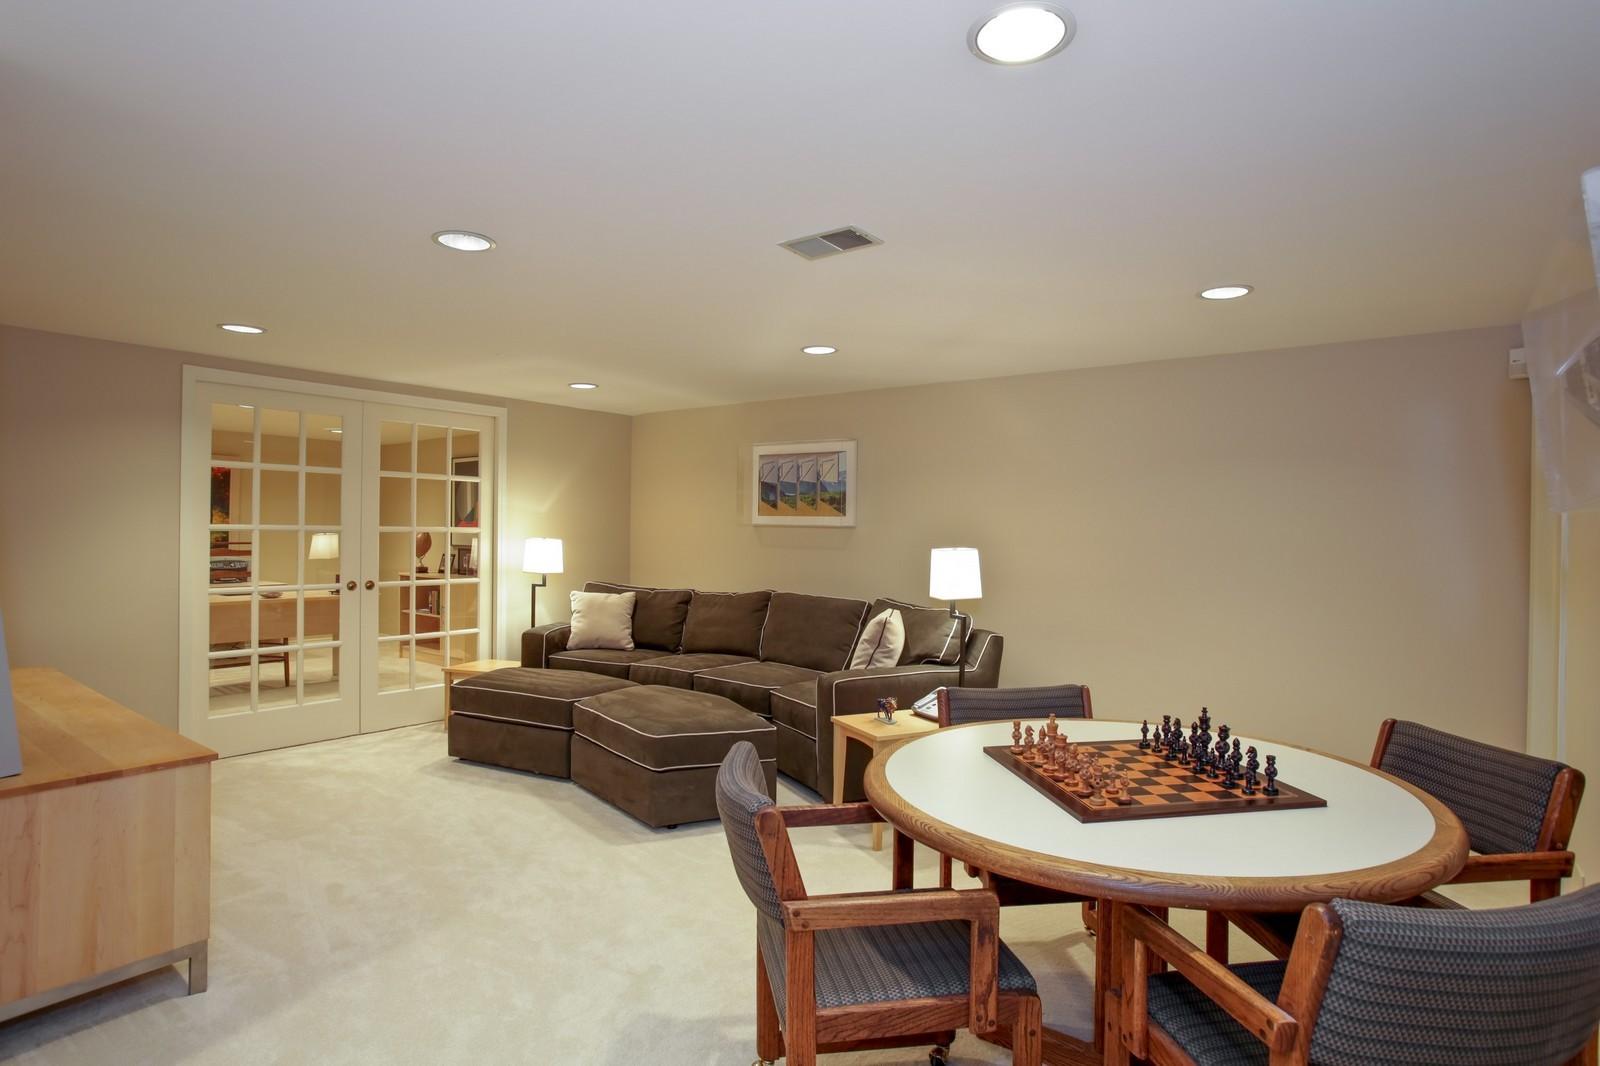 Real Estate Photography - 25W445 Plamondon Rd, Wheaton, IL, 60189 - Basement Rec Room